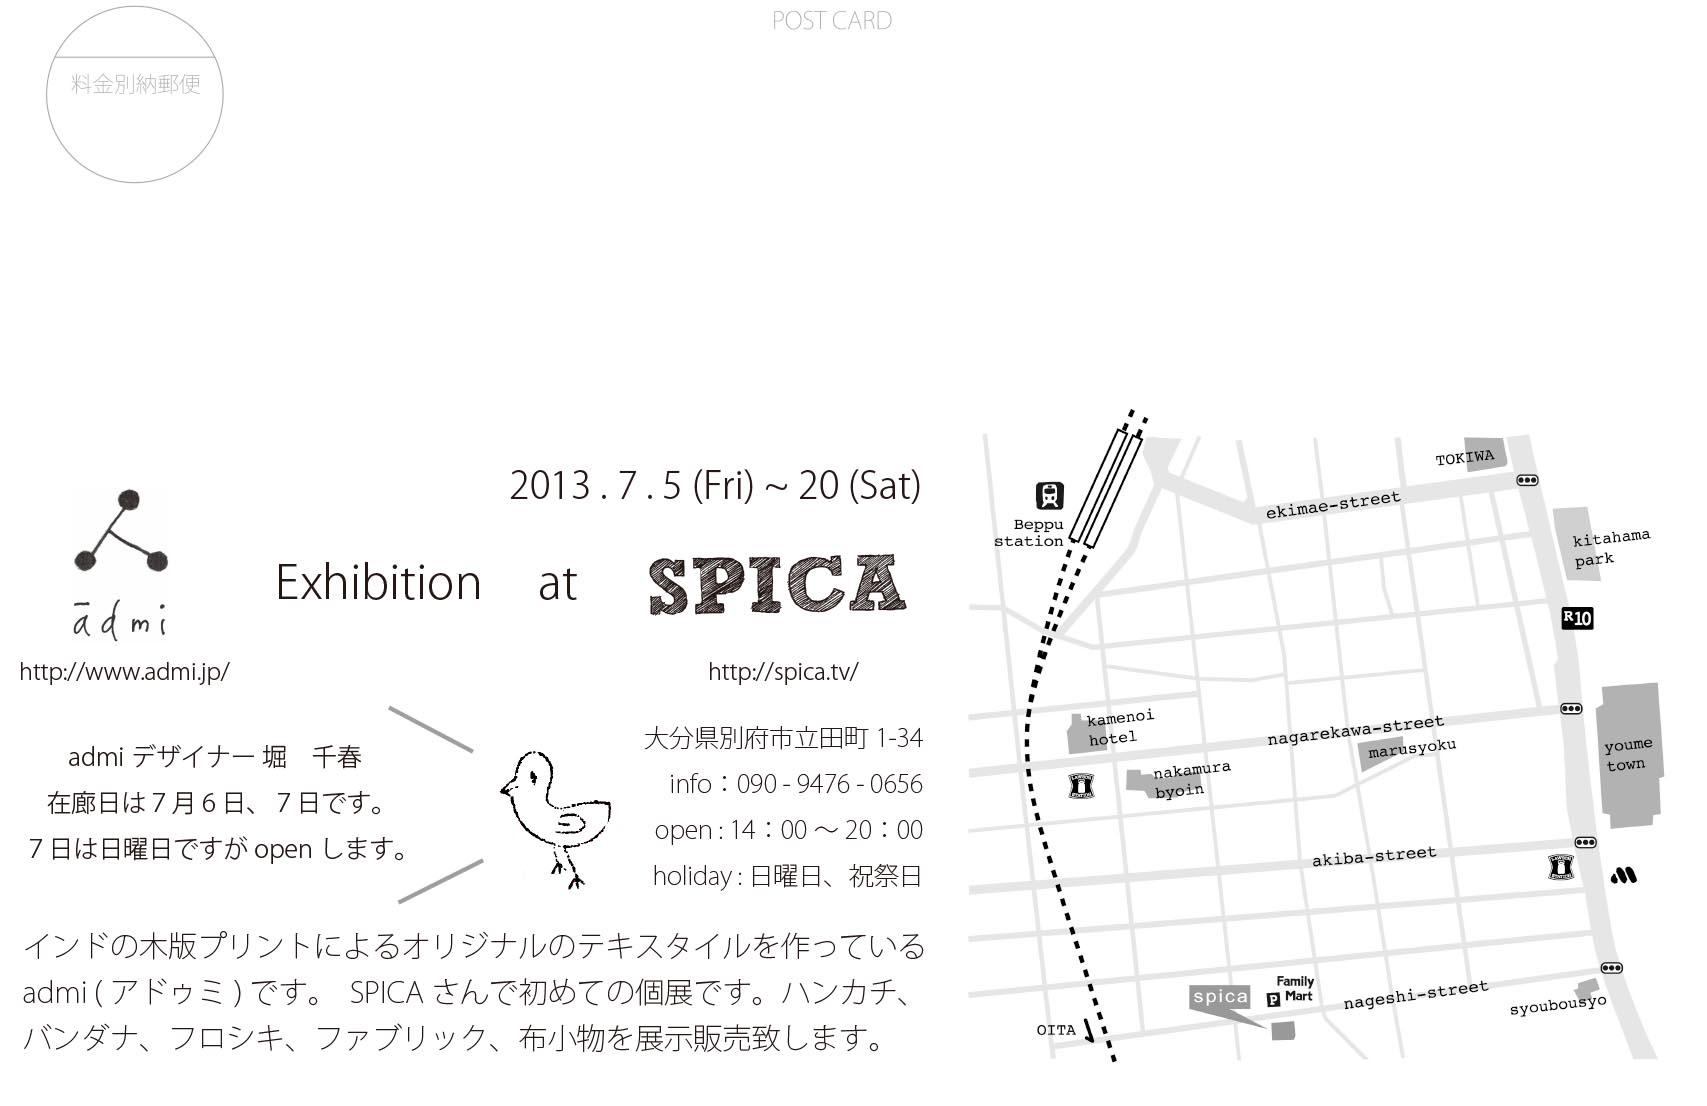 SPICAさんで初めての個展です!_f0167776_1157498.jpg